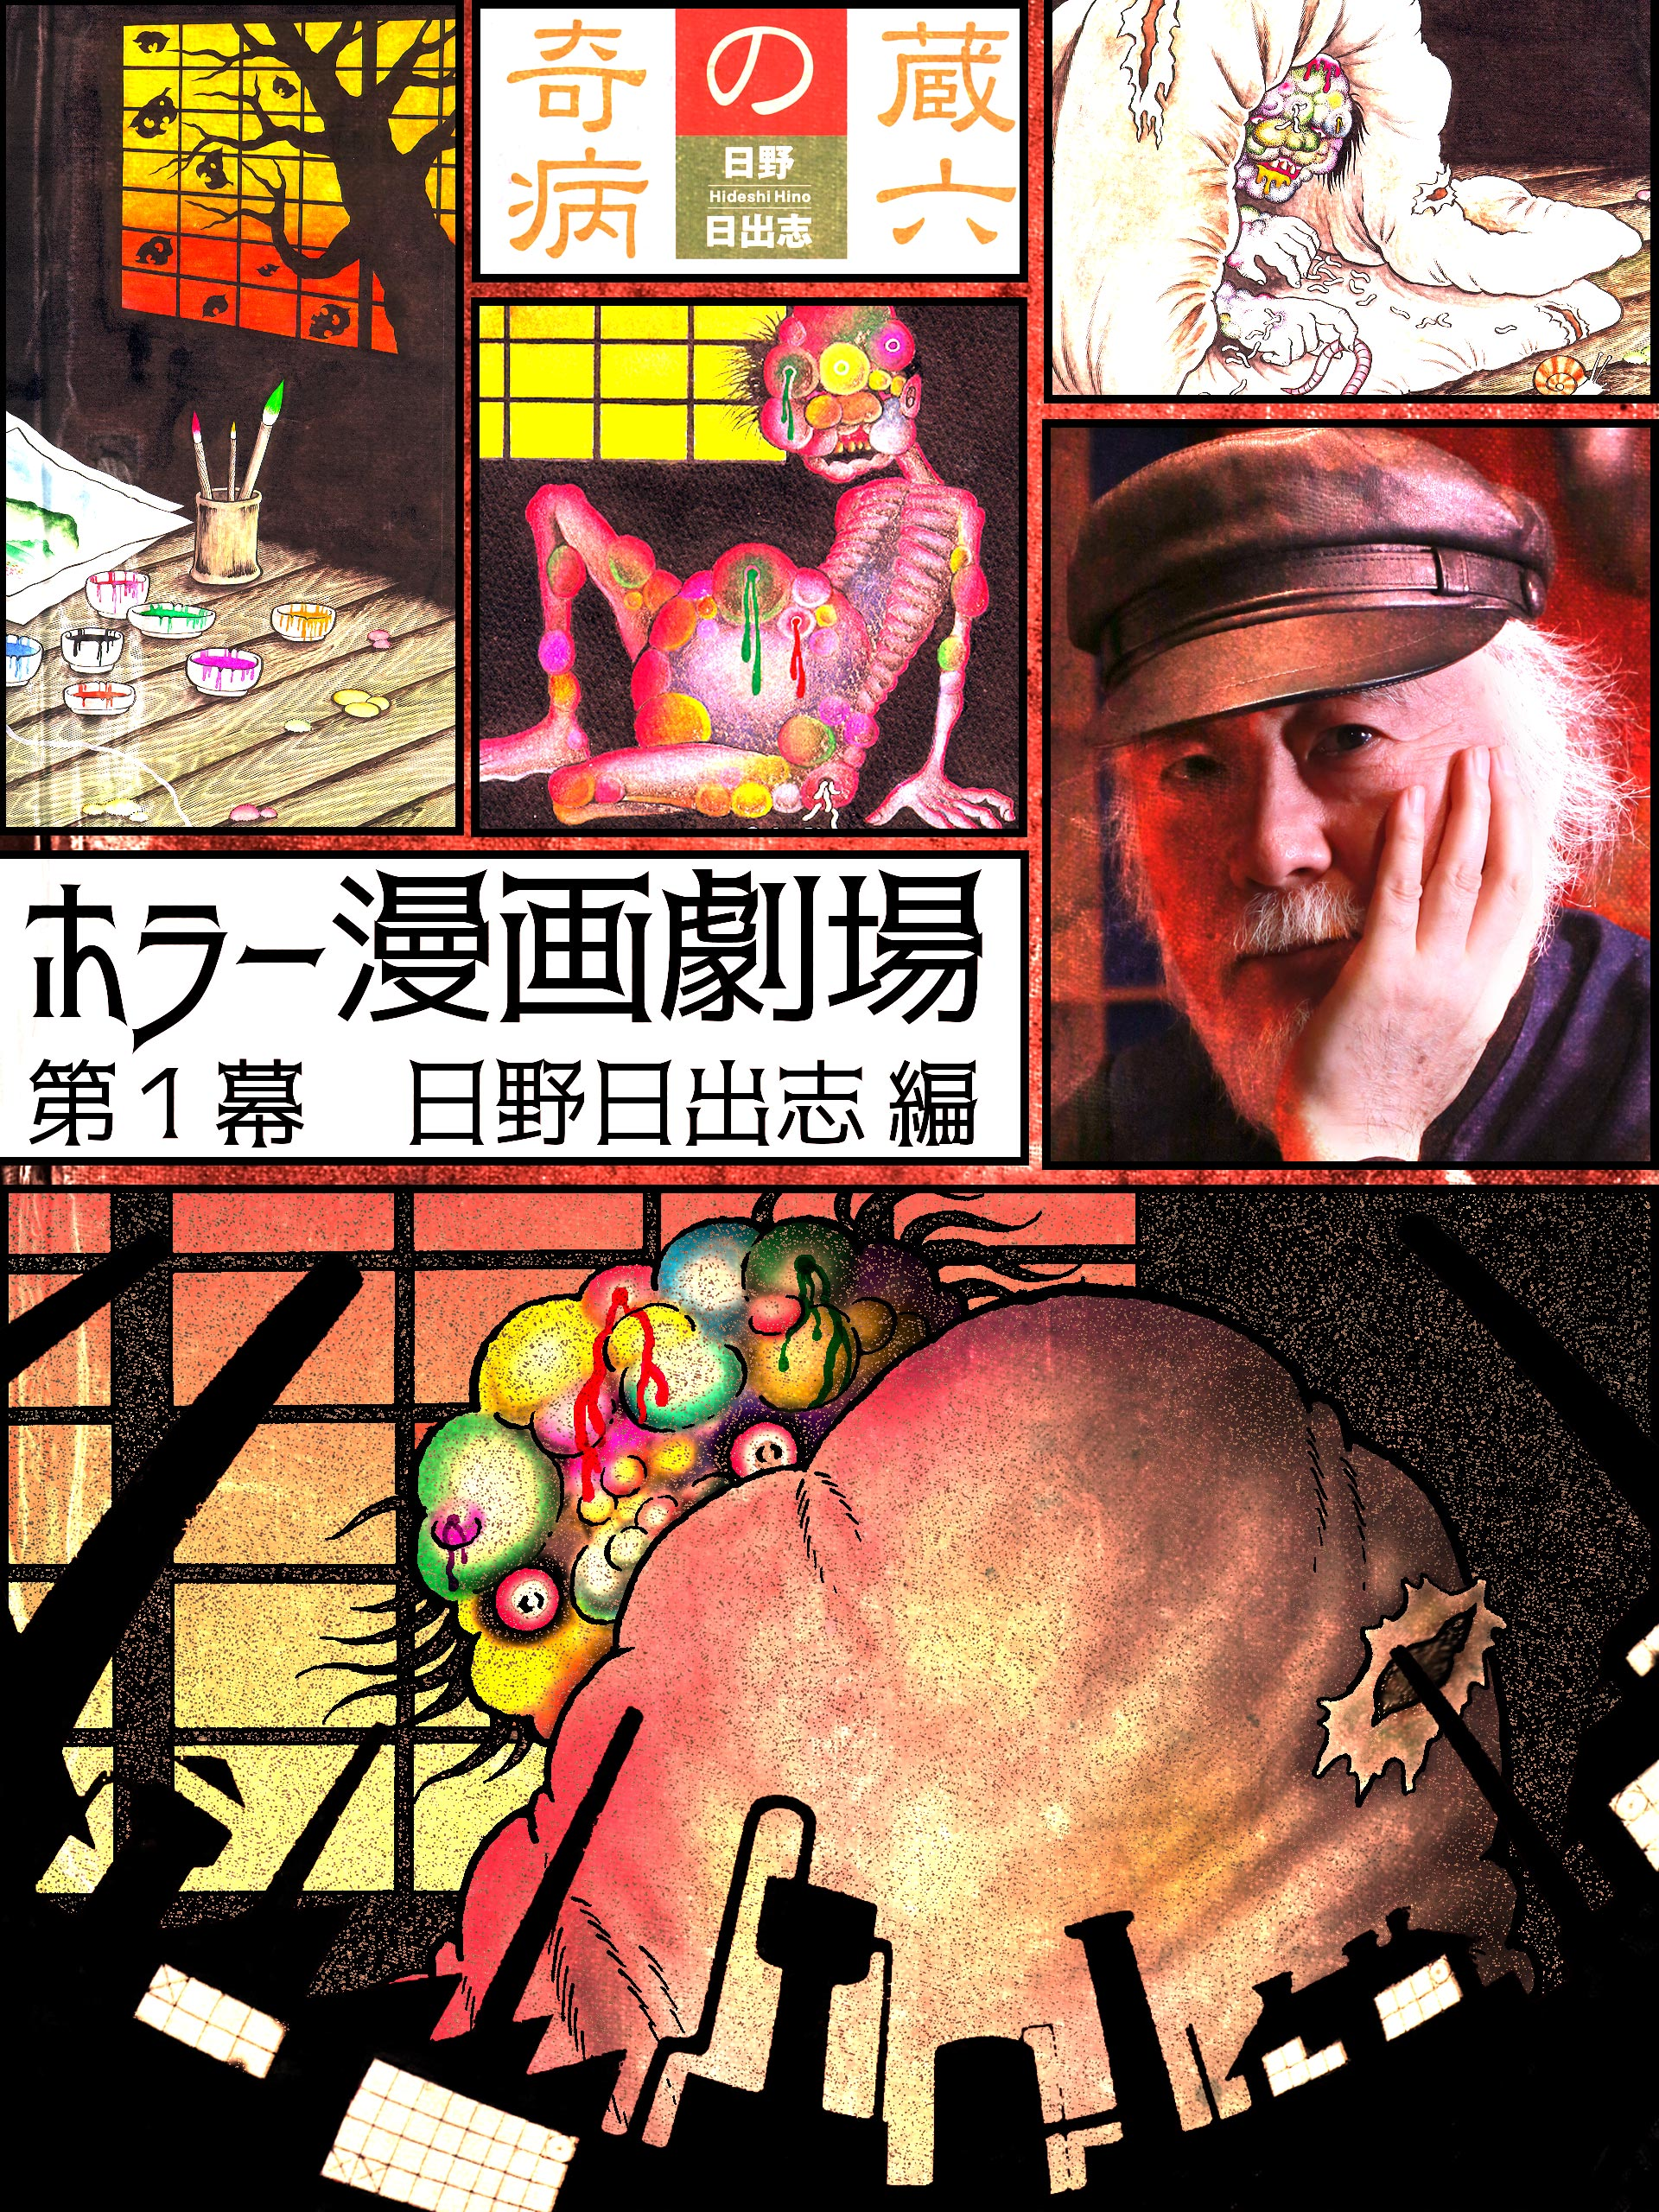 ホラー漫画劇場 第1幕 日野日出志編